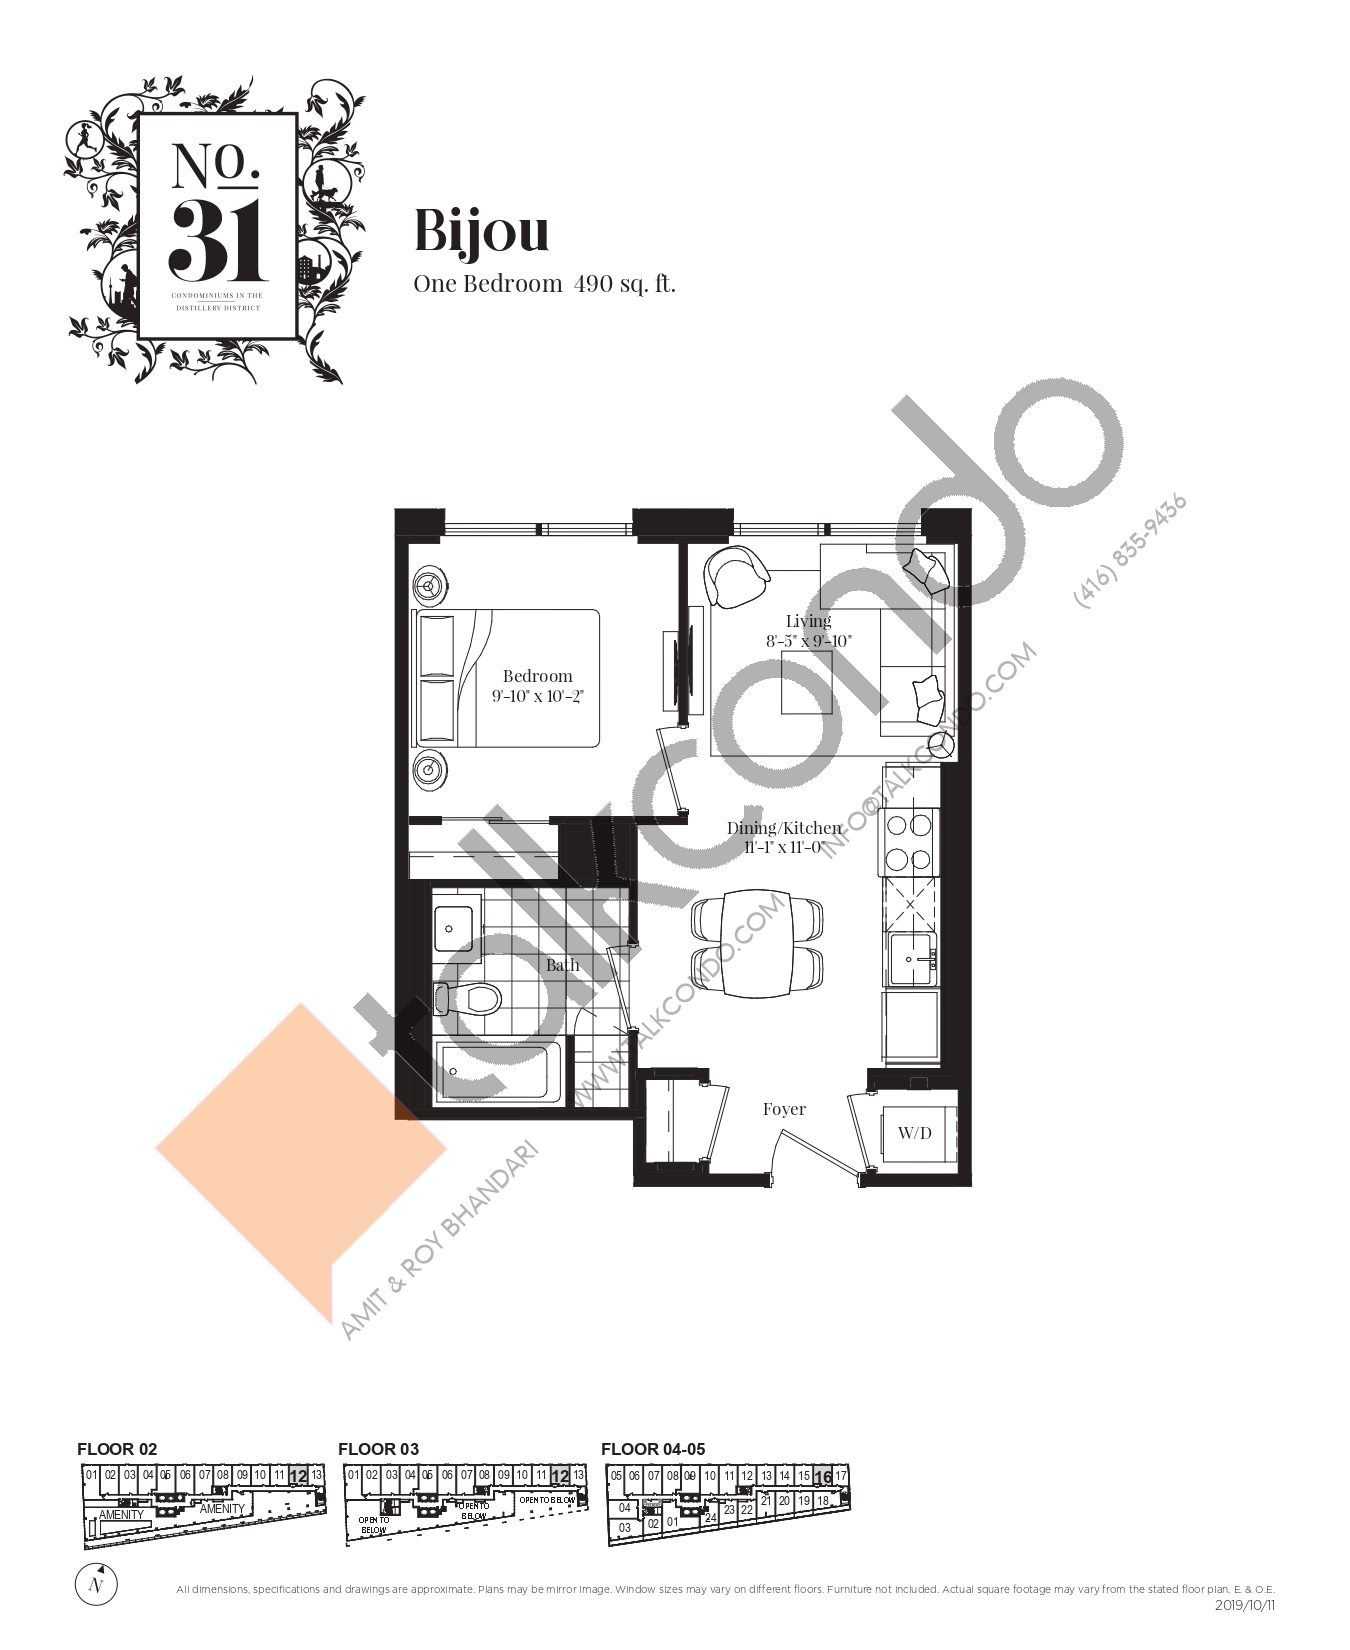 Bijou Floor Plan at No. 31 Condos - 490 sq.ft